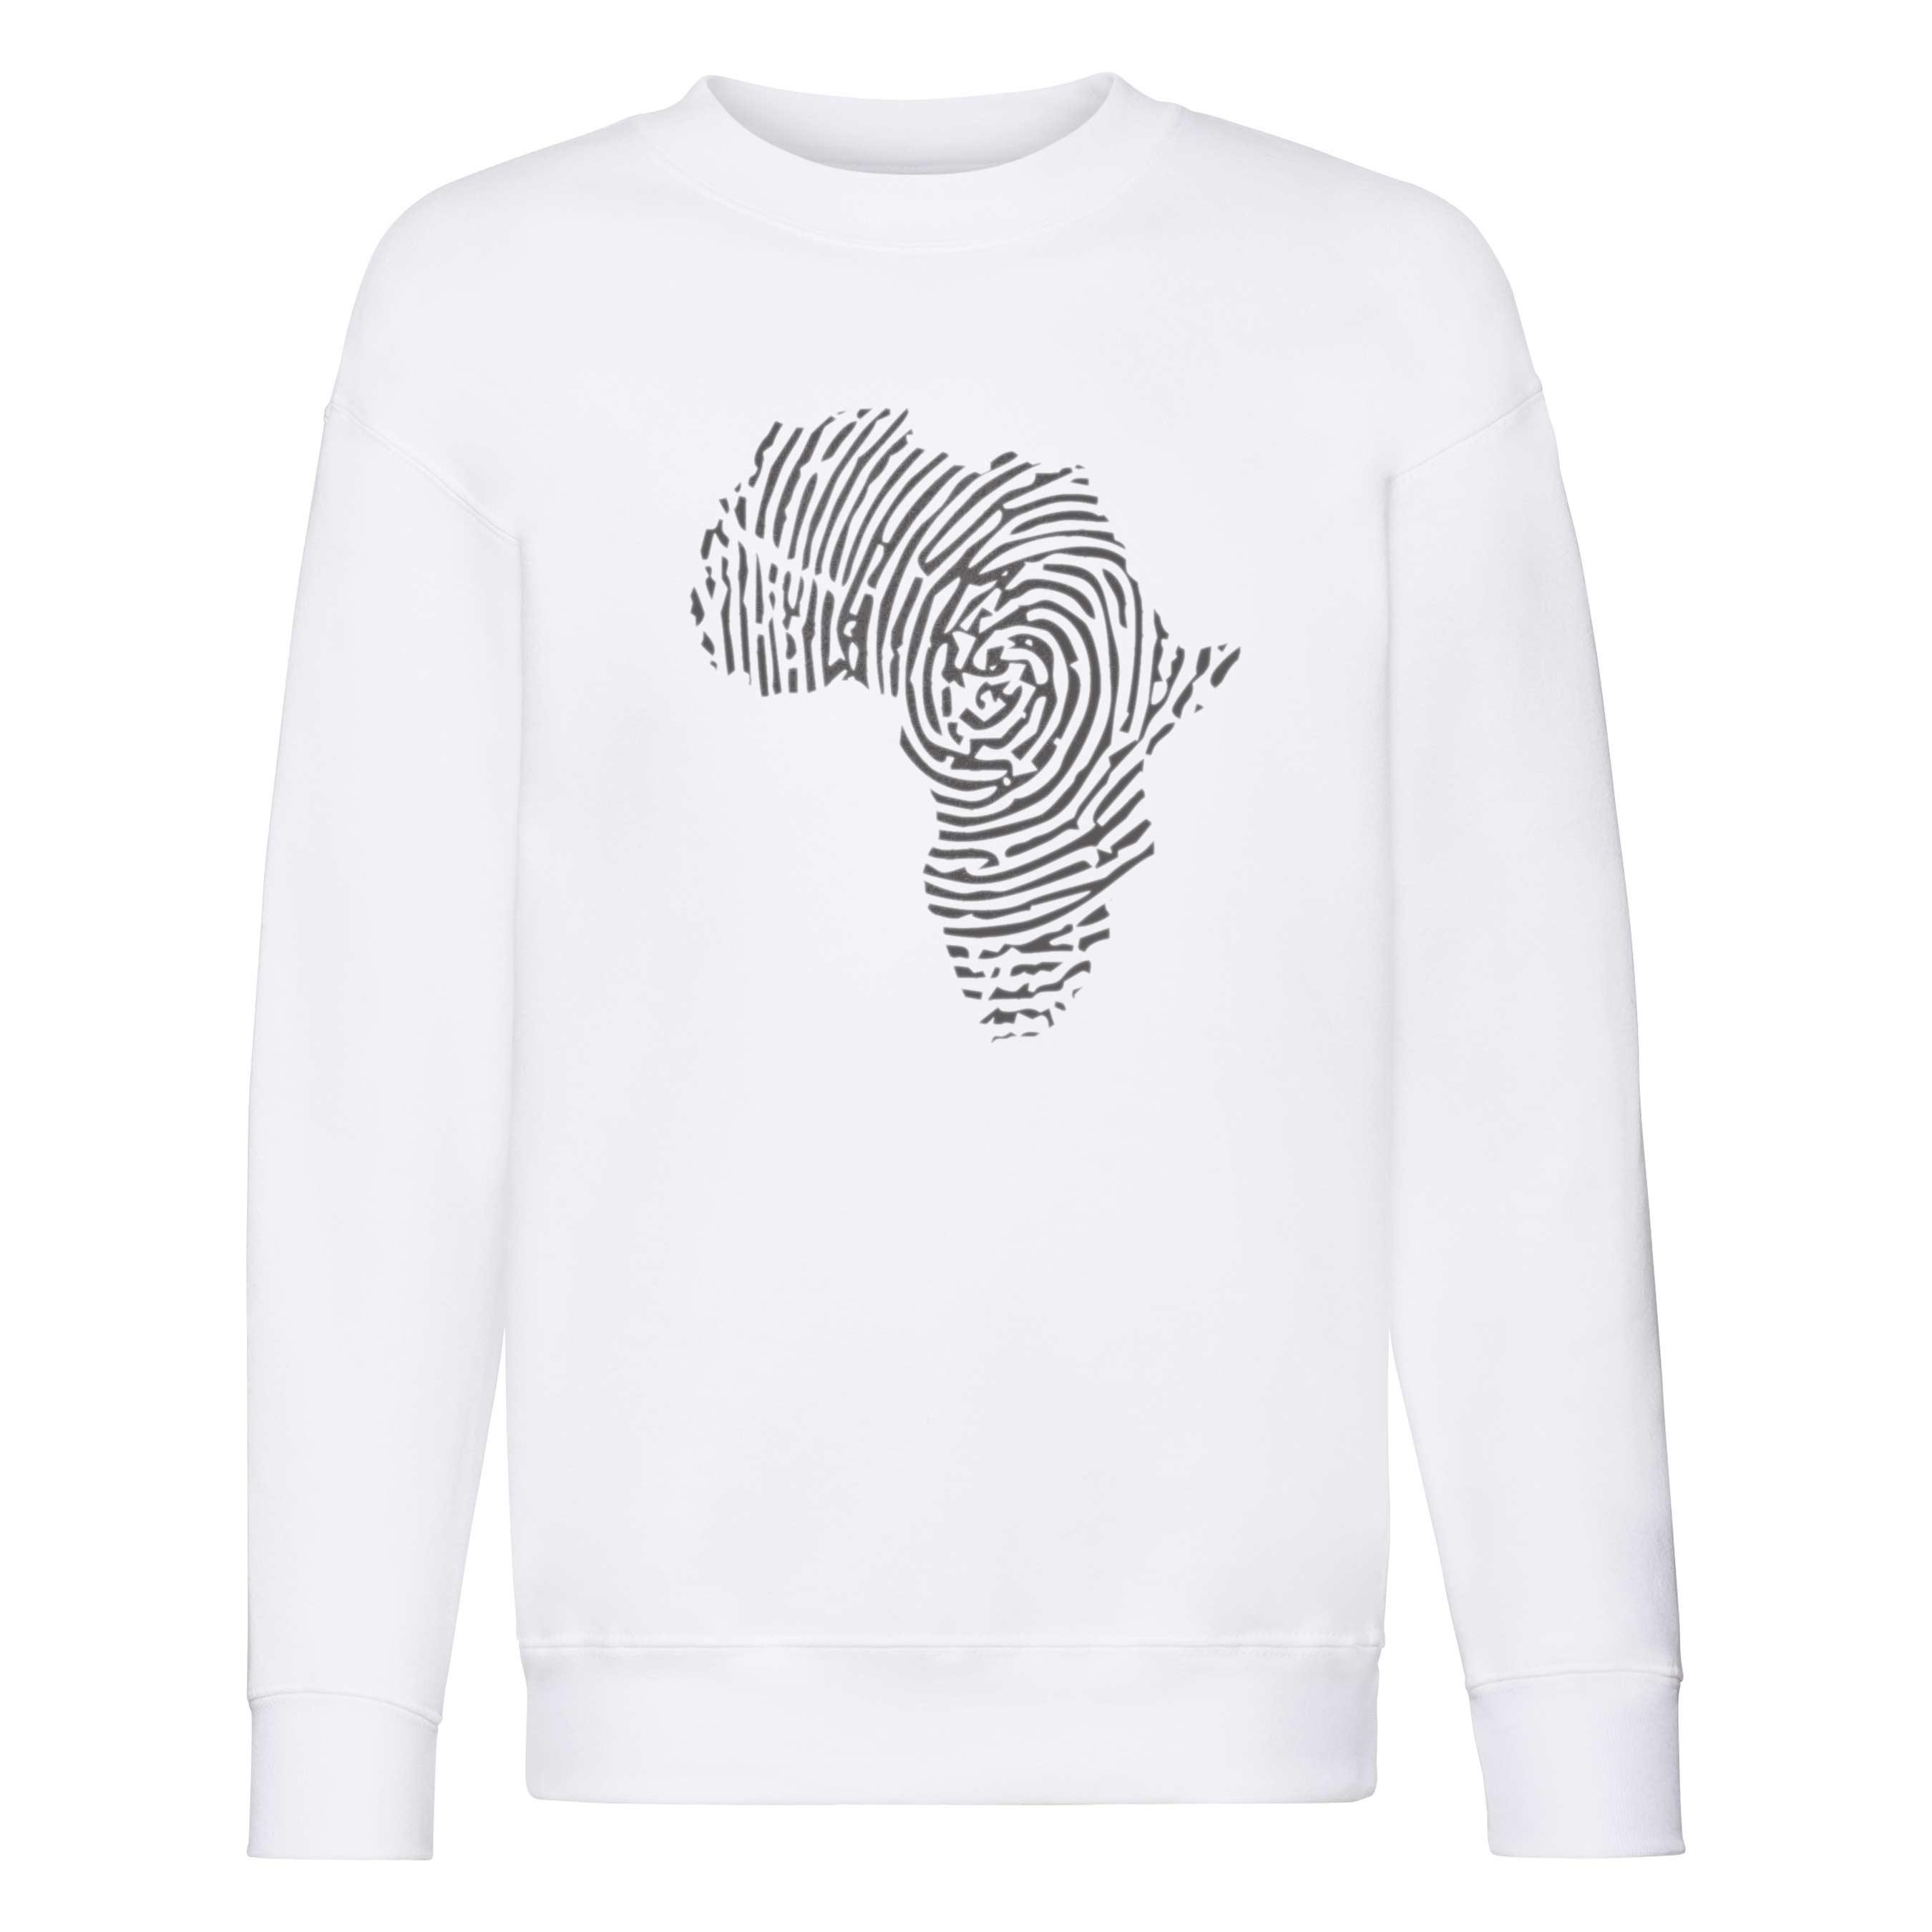 Africa Print design for t-shirt, hoodie & sweatshirt